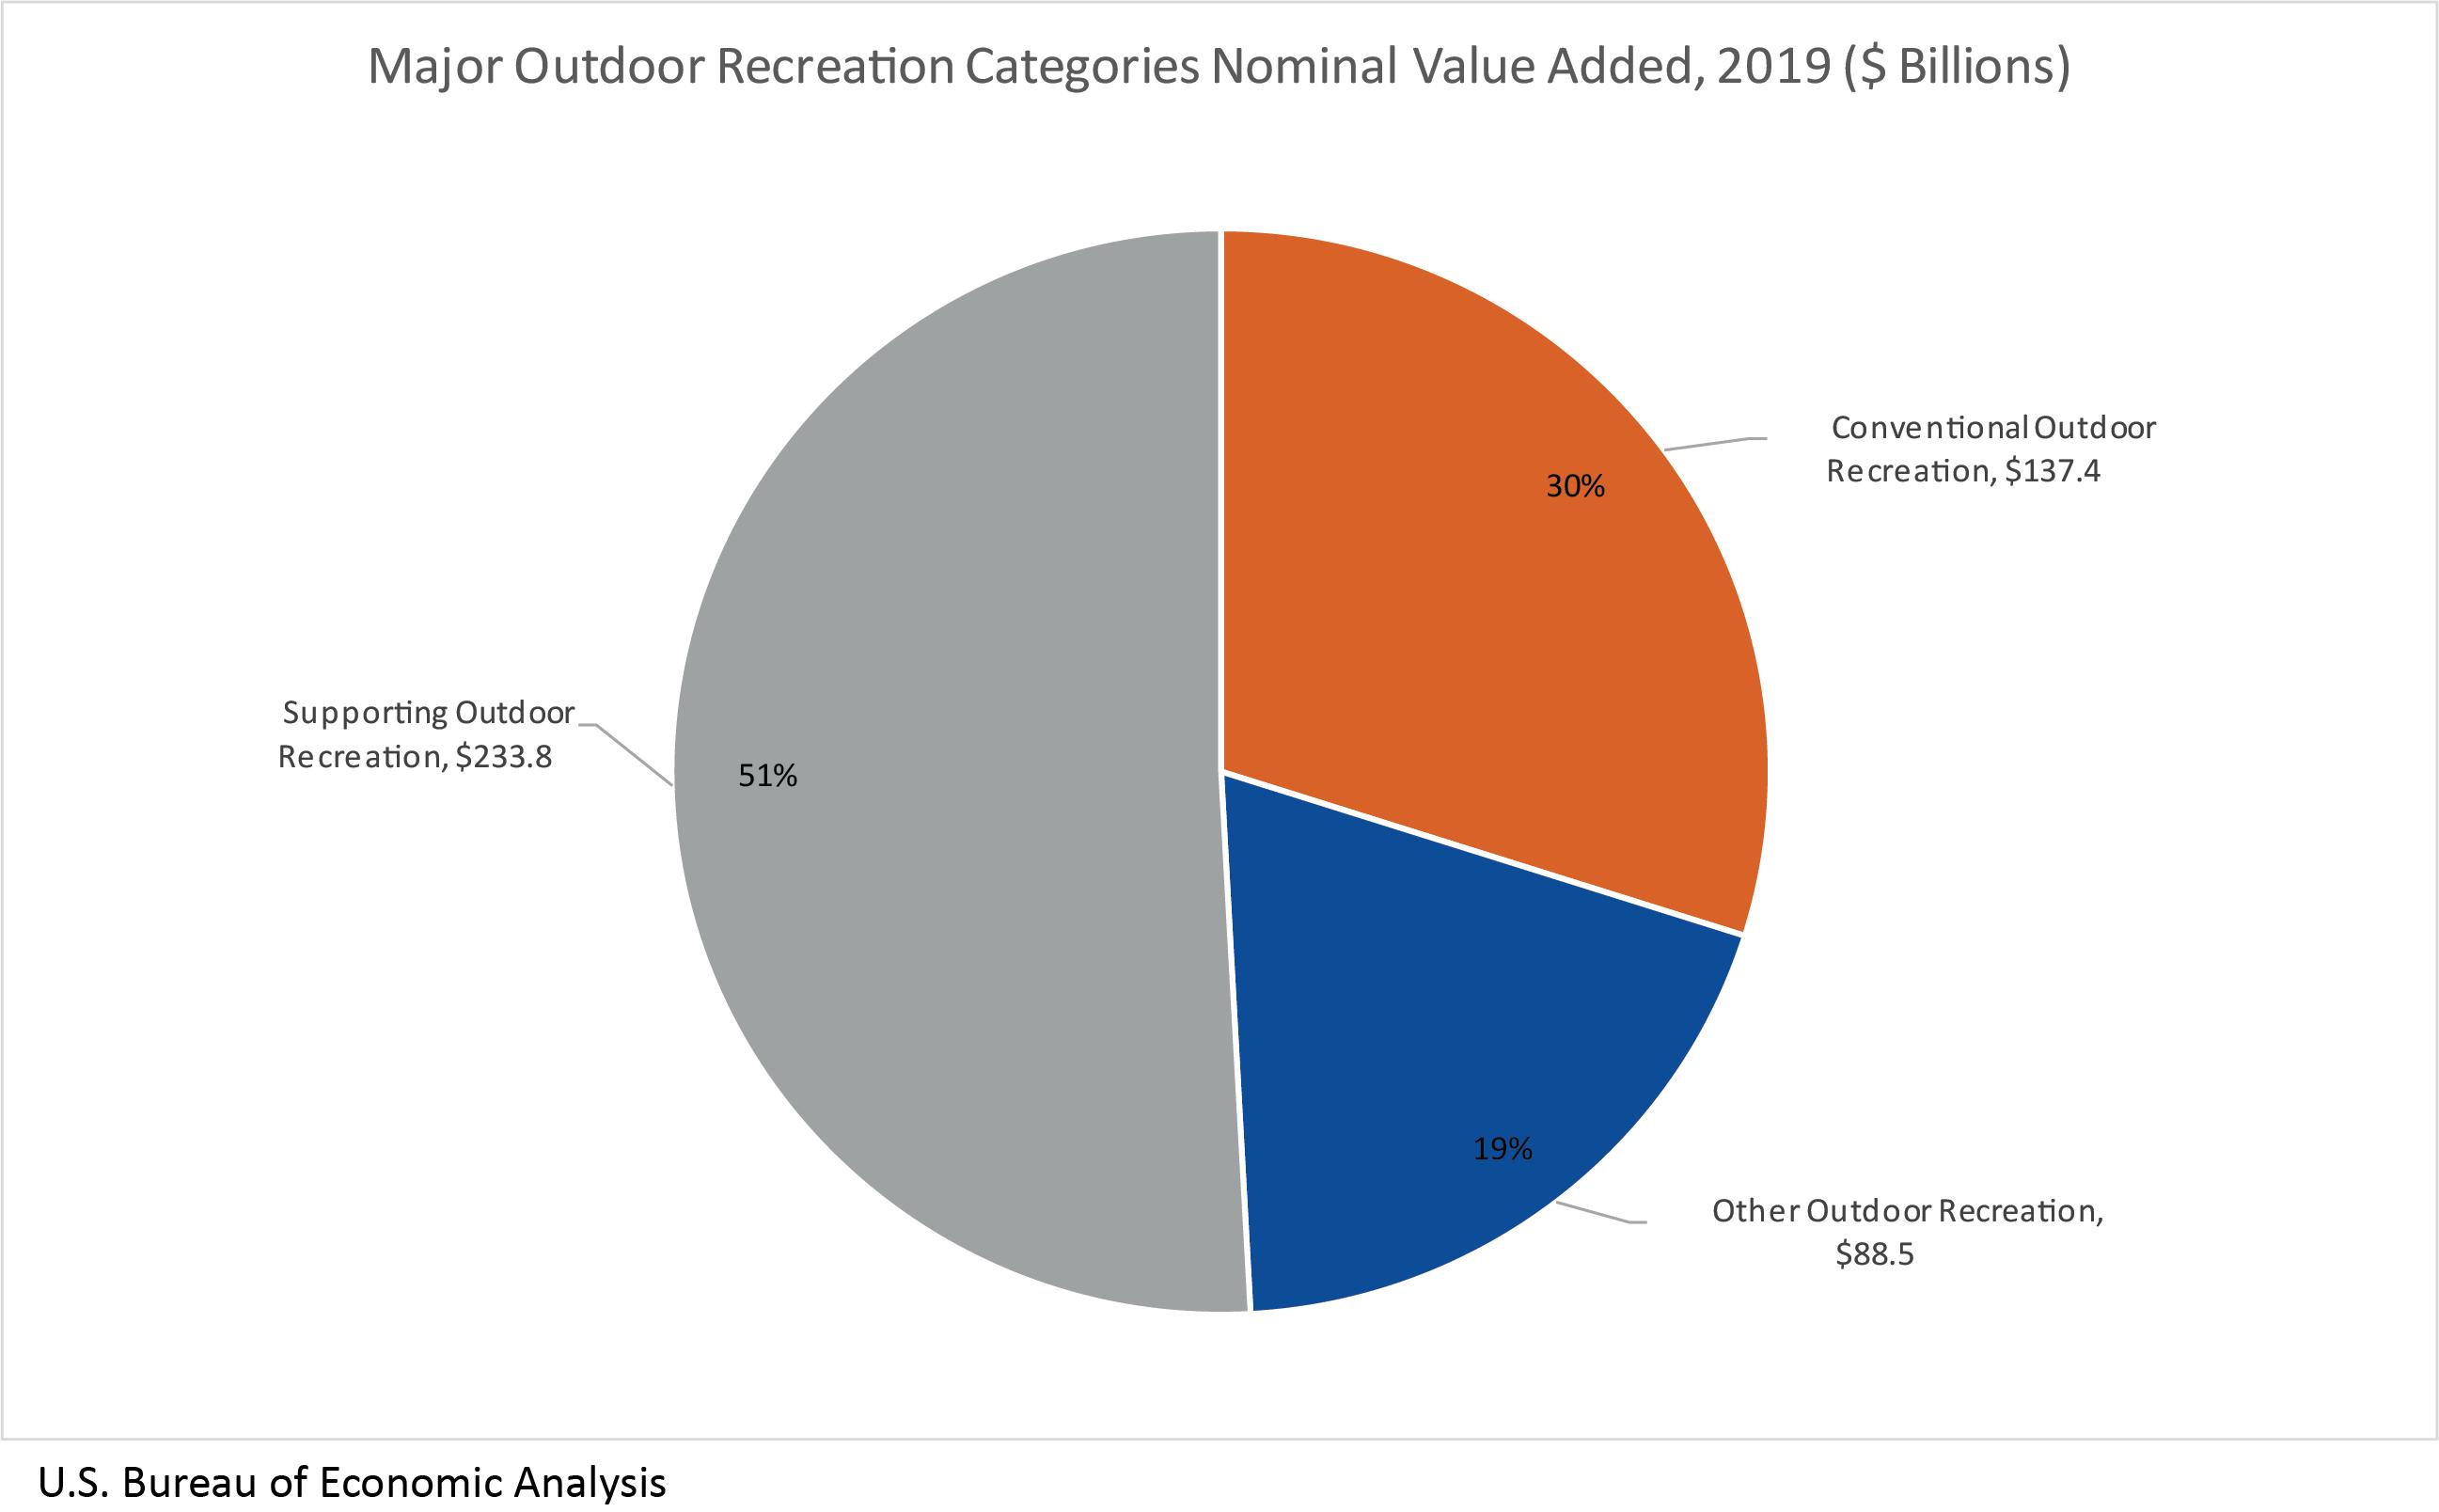 Chart: Major Outdoor Recreation Categories Nominal Value Added, 2019 ($ Billions)